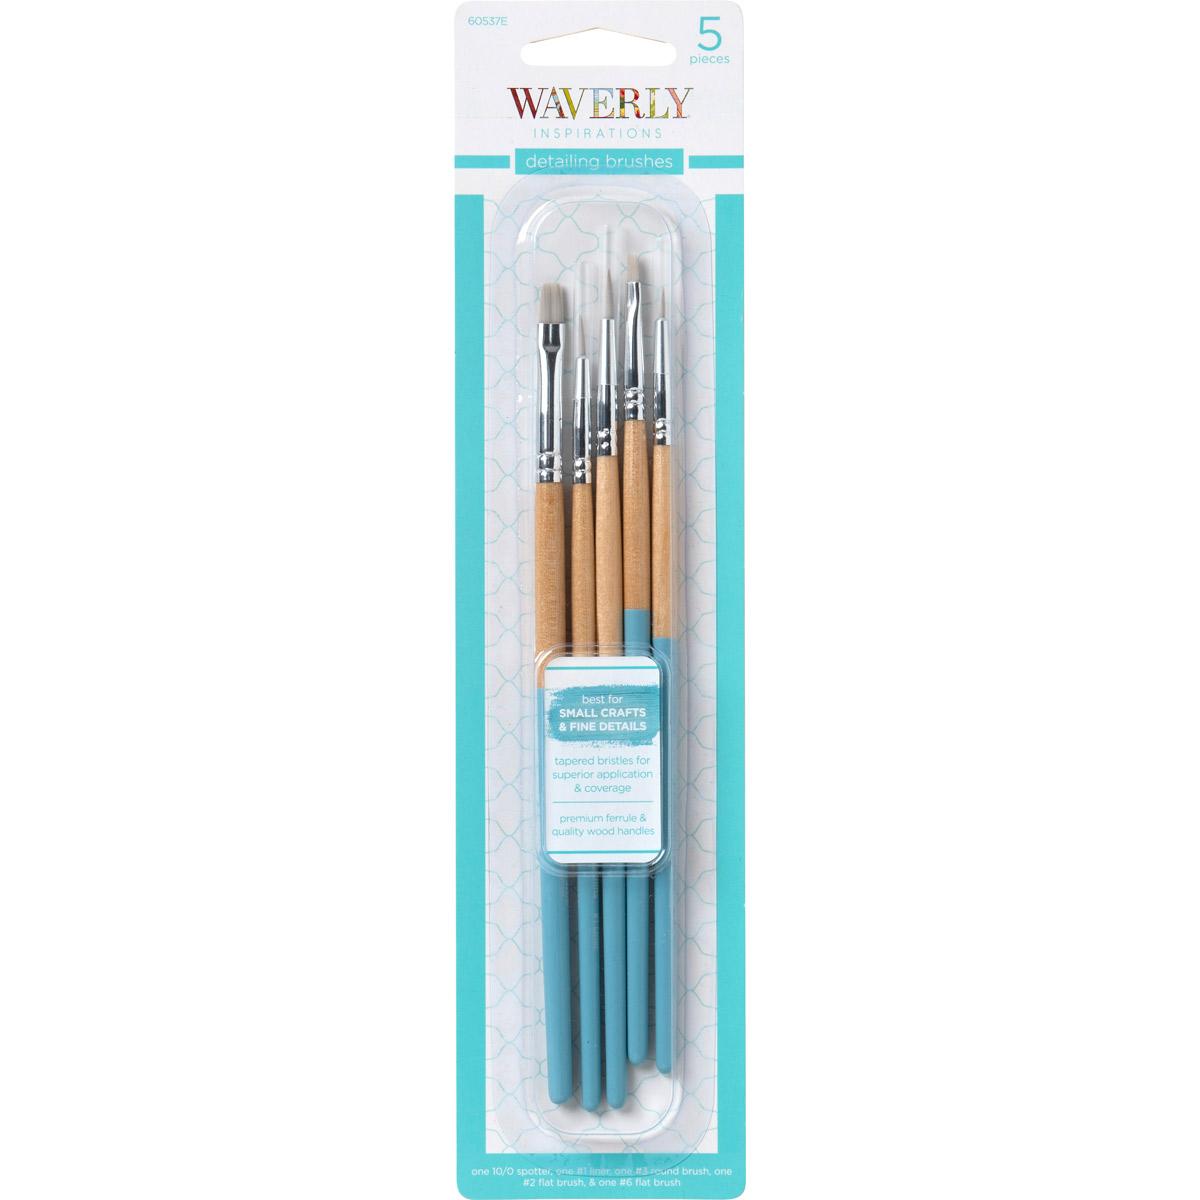 Waverly ® Inspirations Brushes - Detail Set, 5 pc. - 60537E